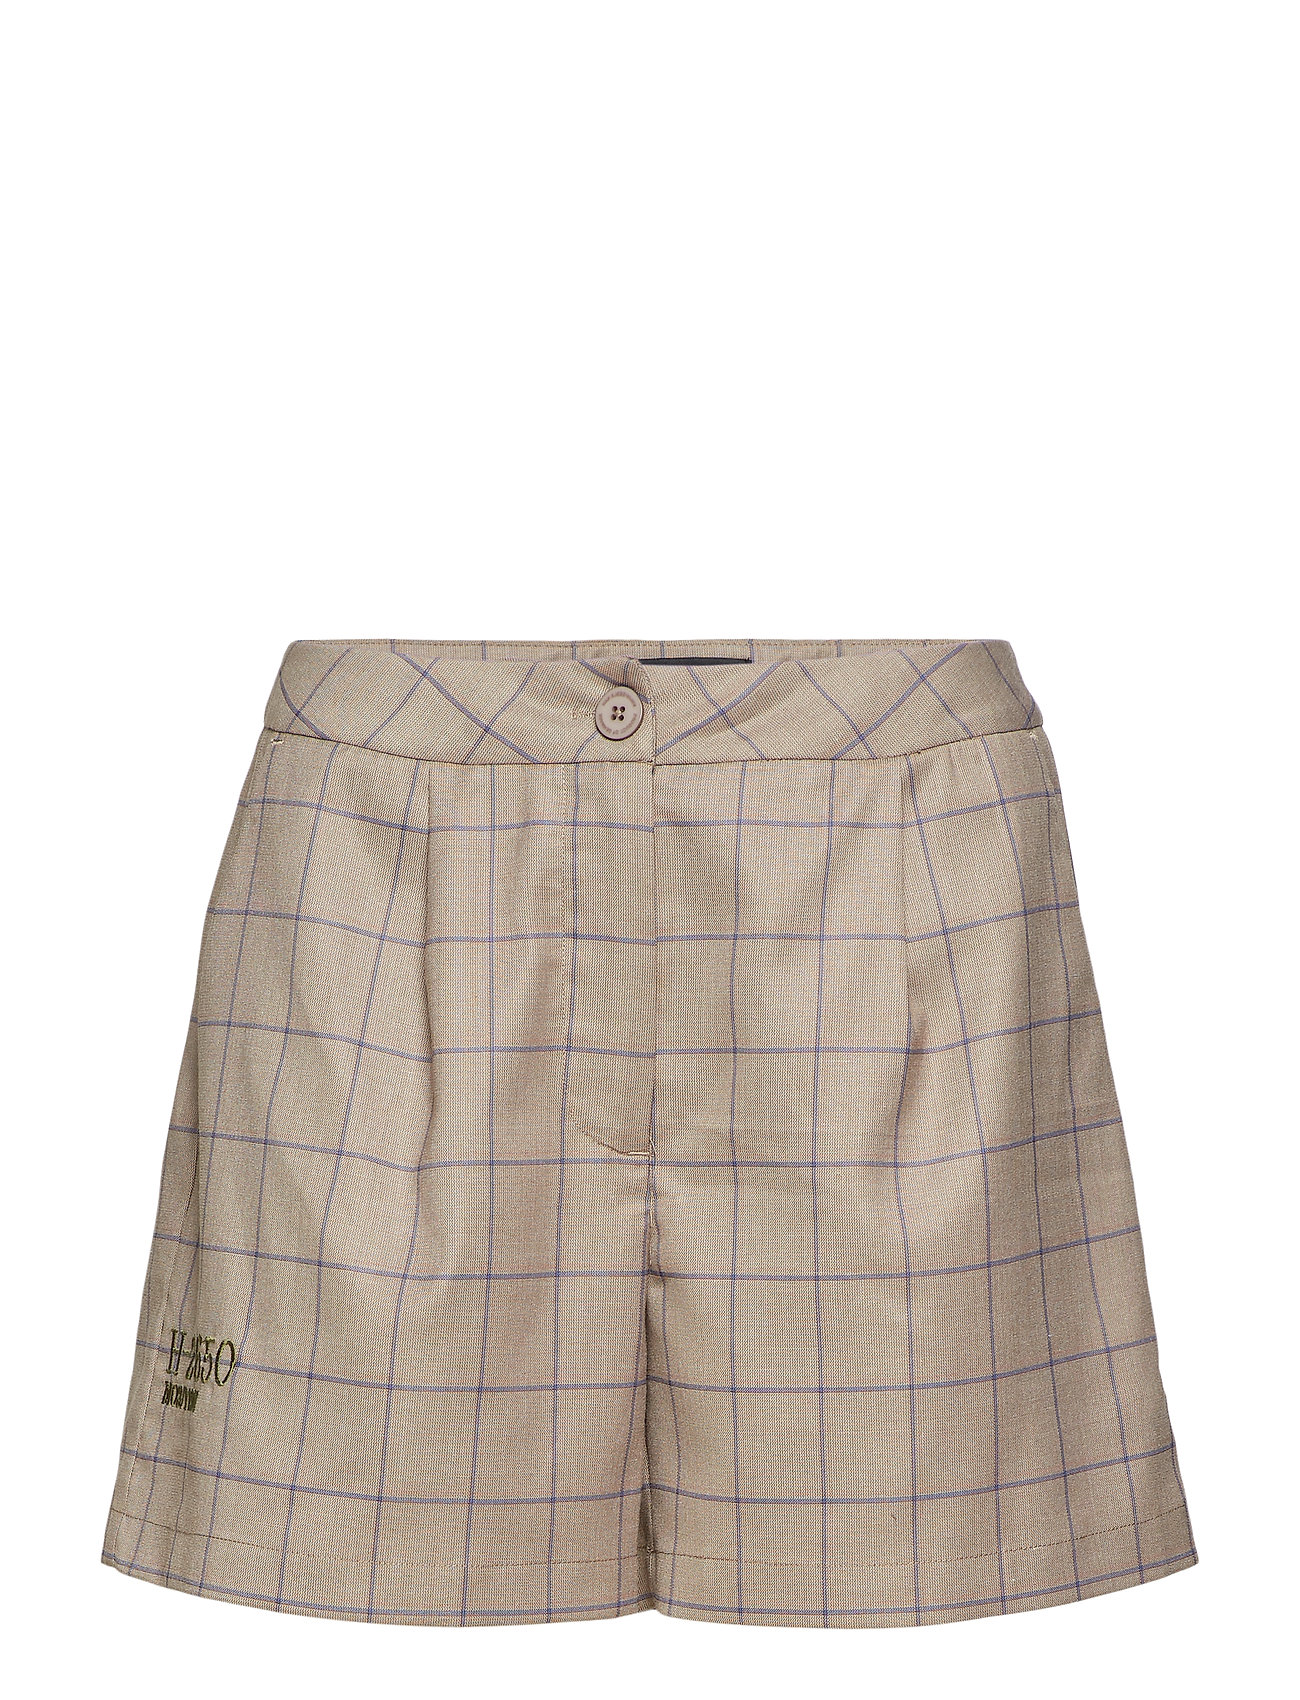 HAN Kjøbenhavn Suit Shorts Shorts